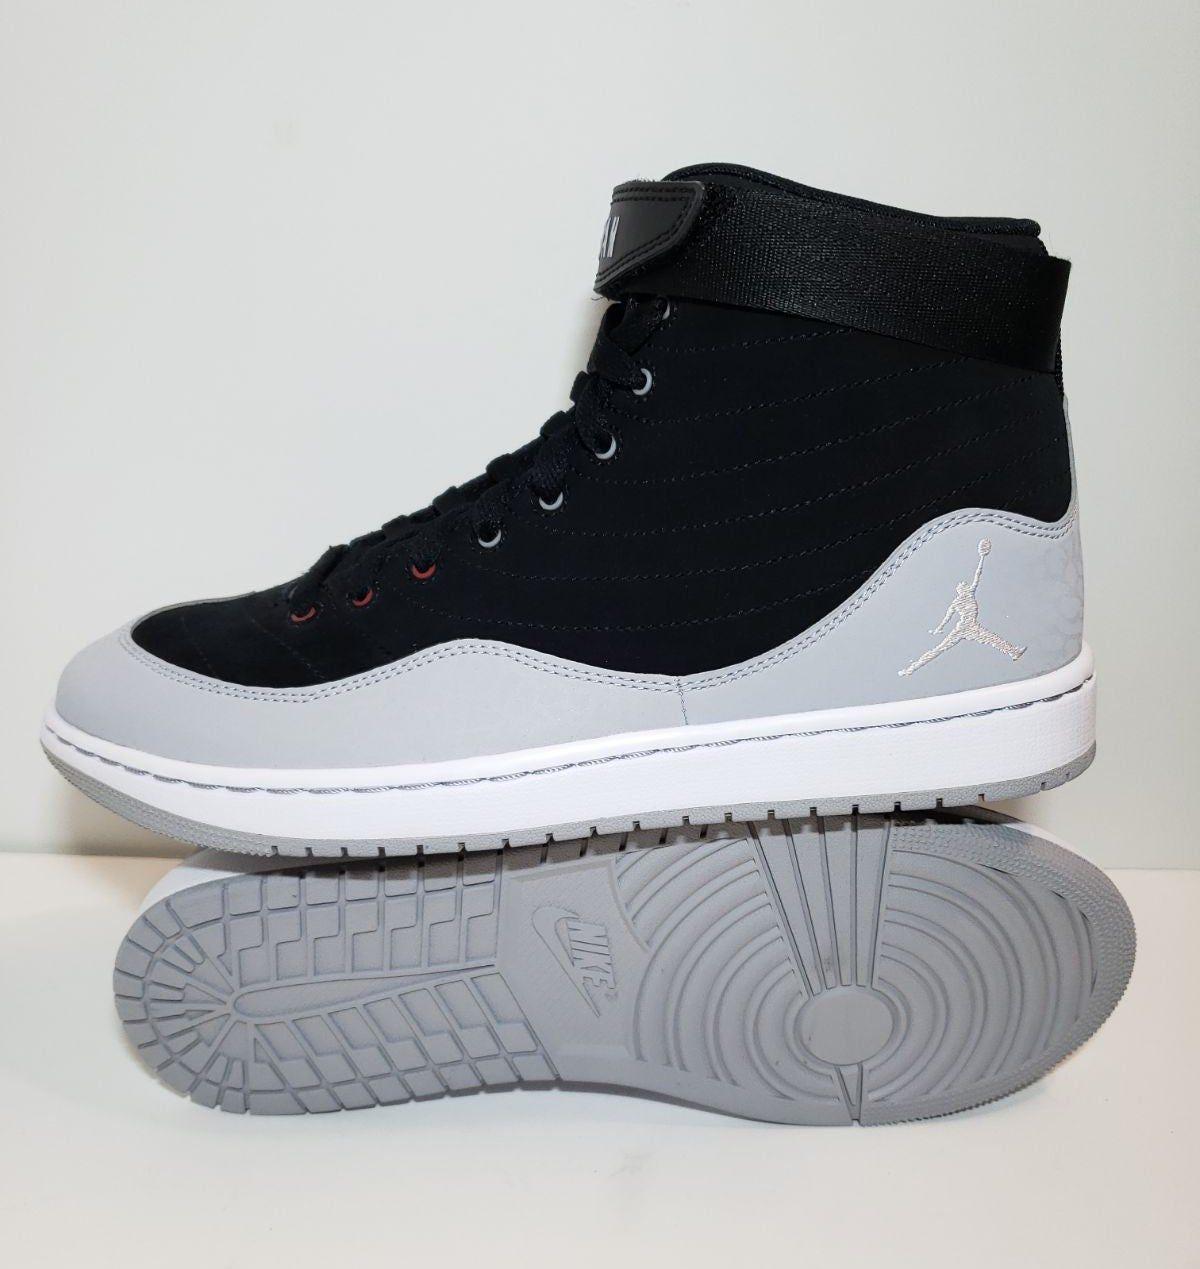 Nike Men's Size 10.5 JORDAN KO 23 BLACK